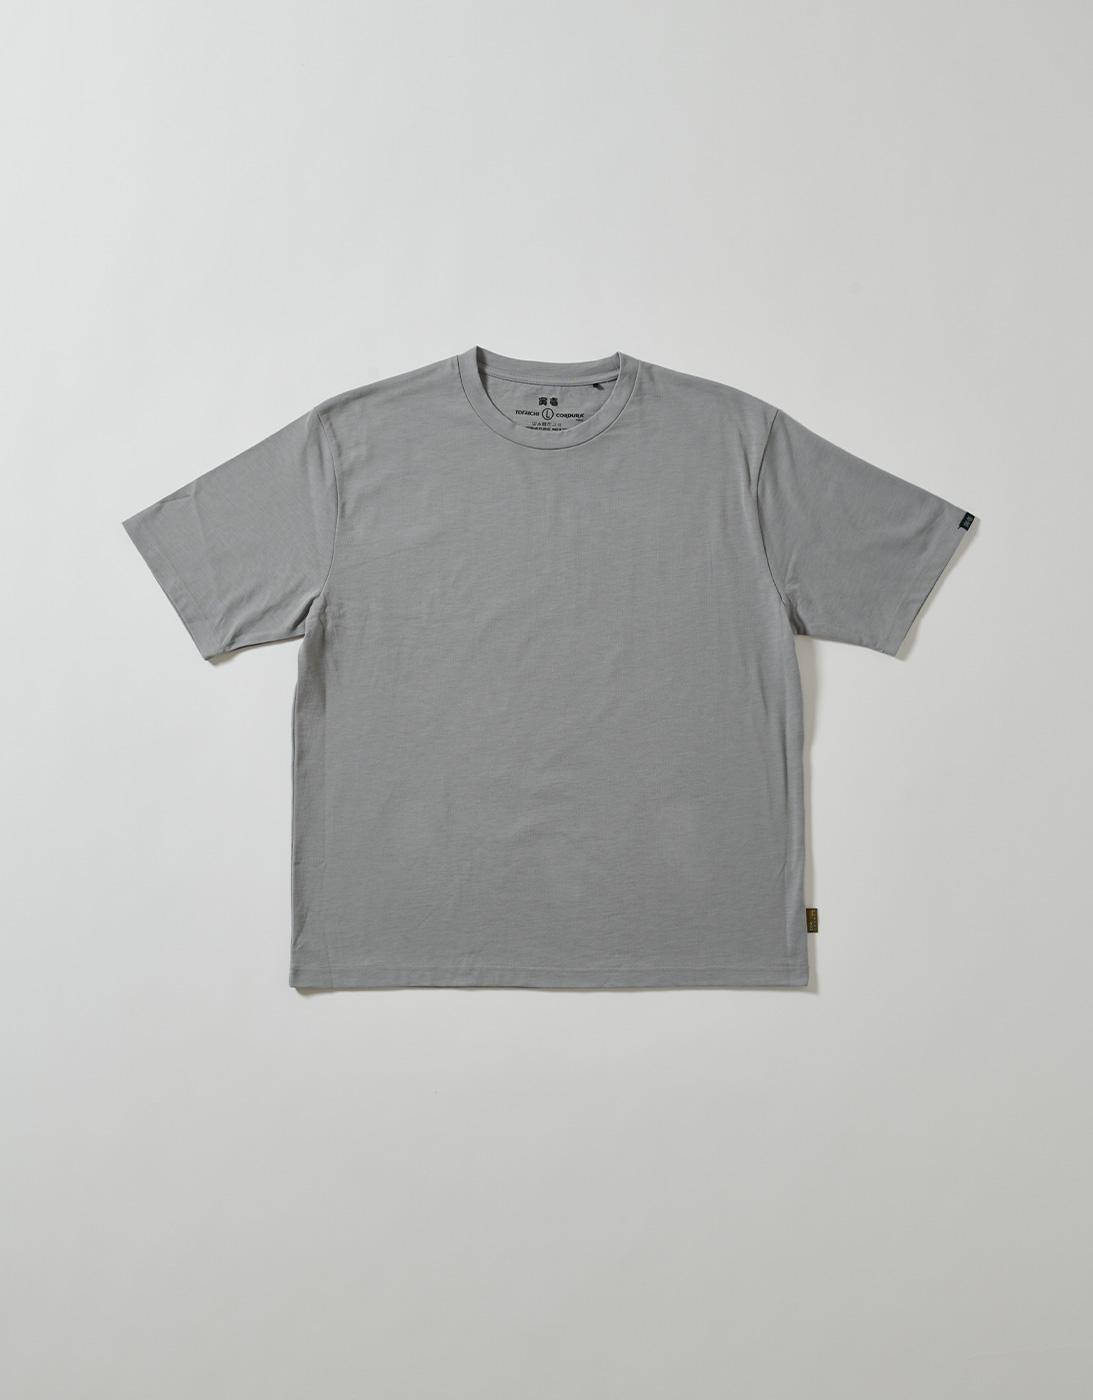 S/S WORK T-SHIRTS 9523-619 GRAY